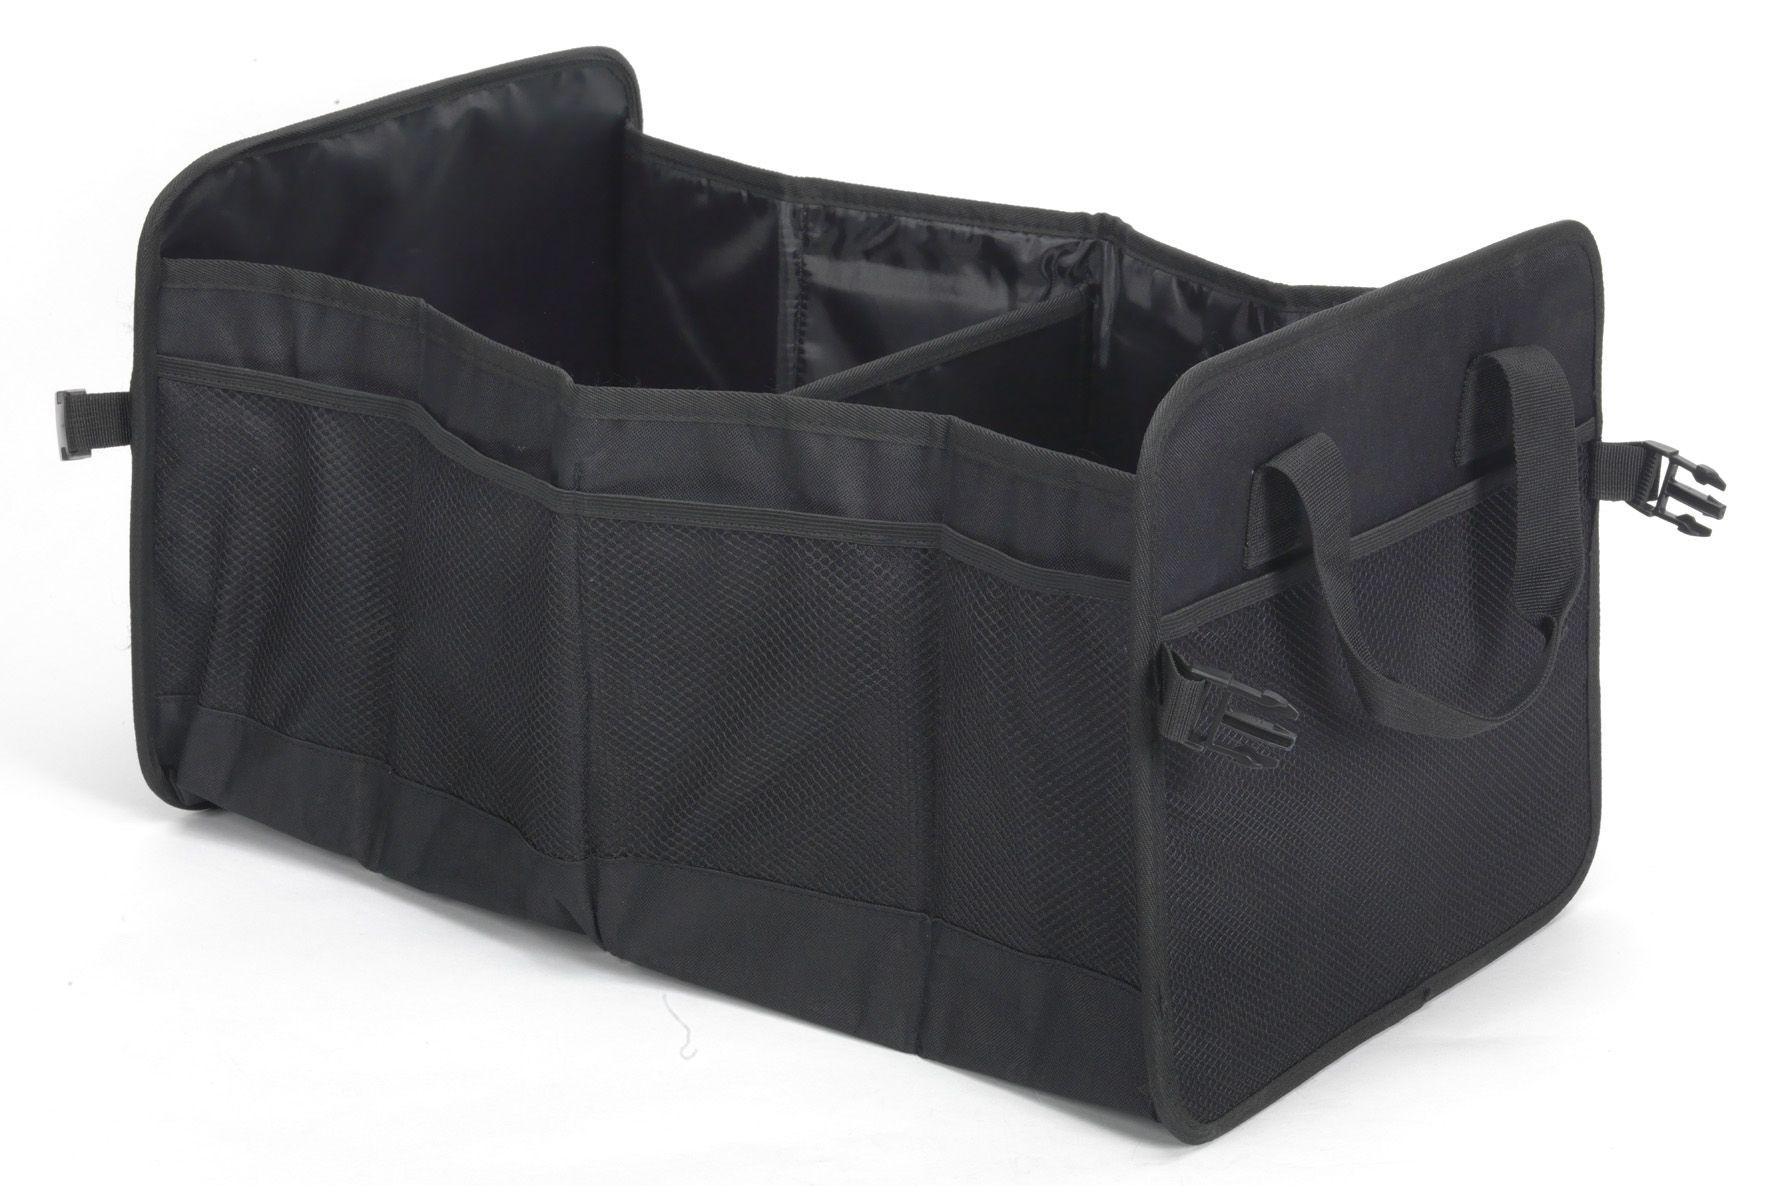 Sealey Car Boot Organizer 12 Compartment